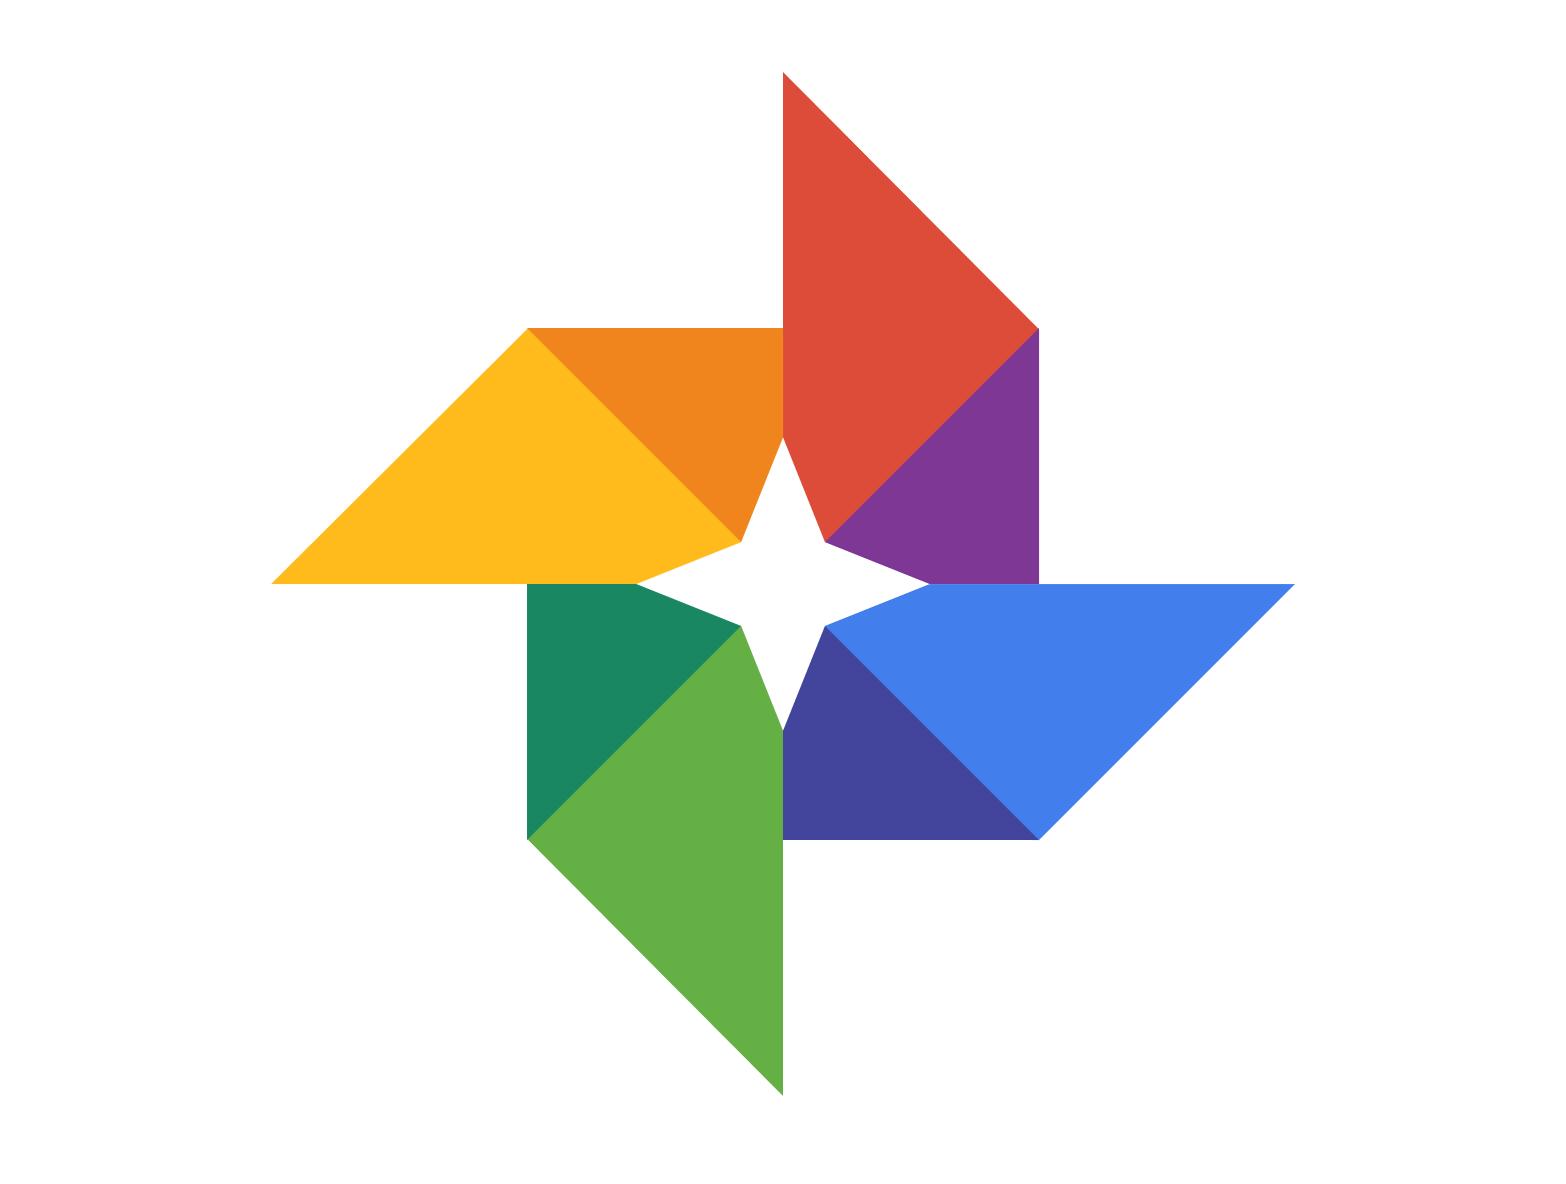 nexusae0_Google-Photos-icon-logo